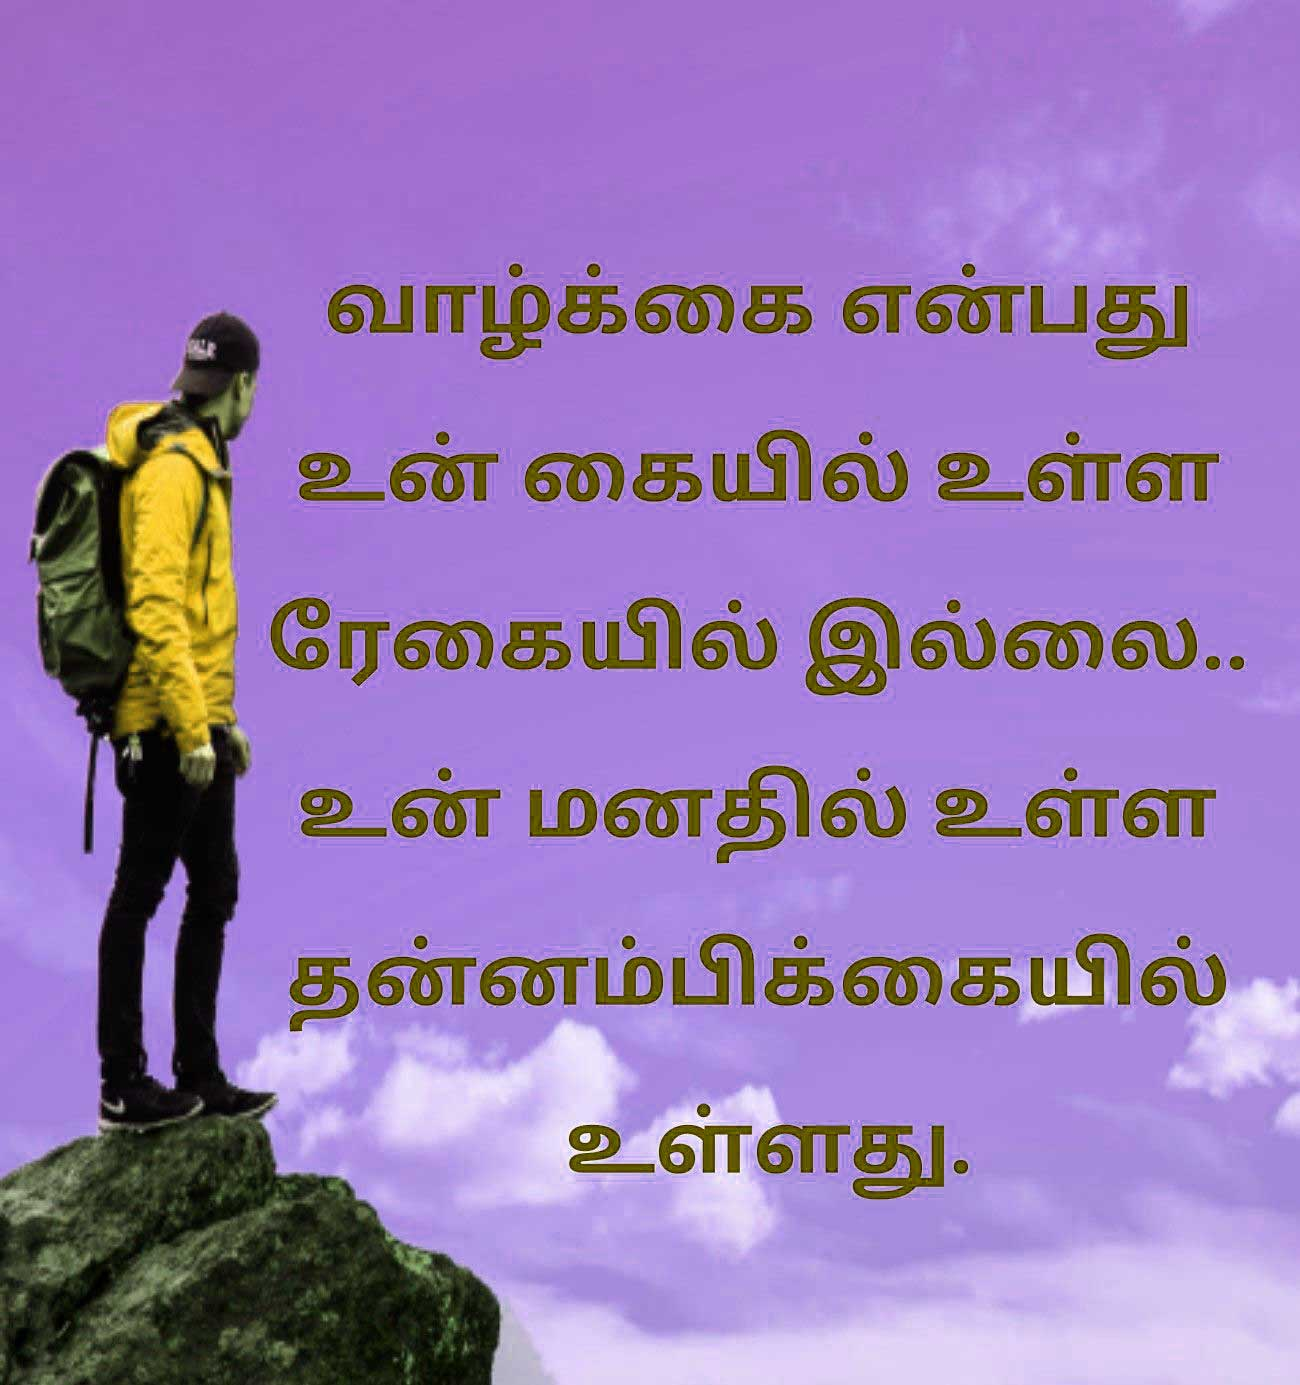 Best Tamil Whatsapp Dp Wallpaper Images